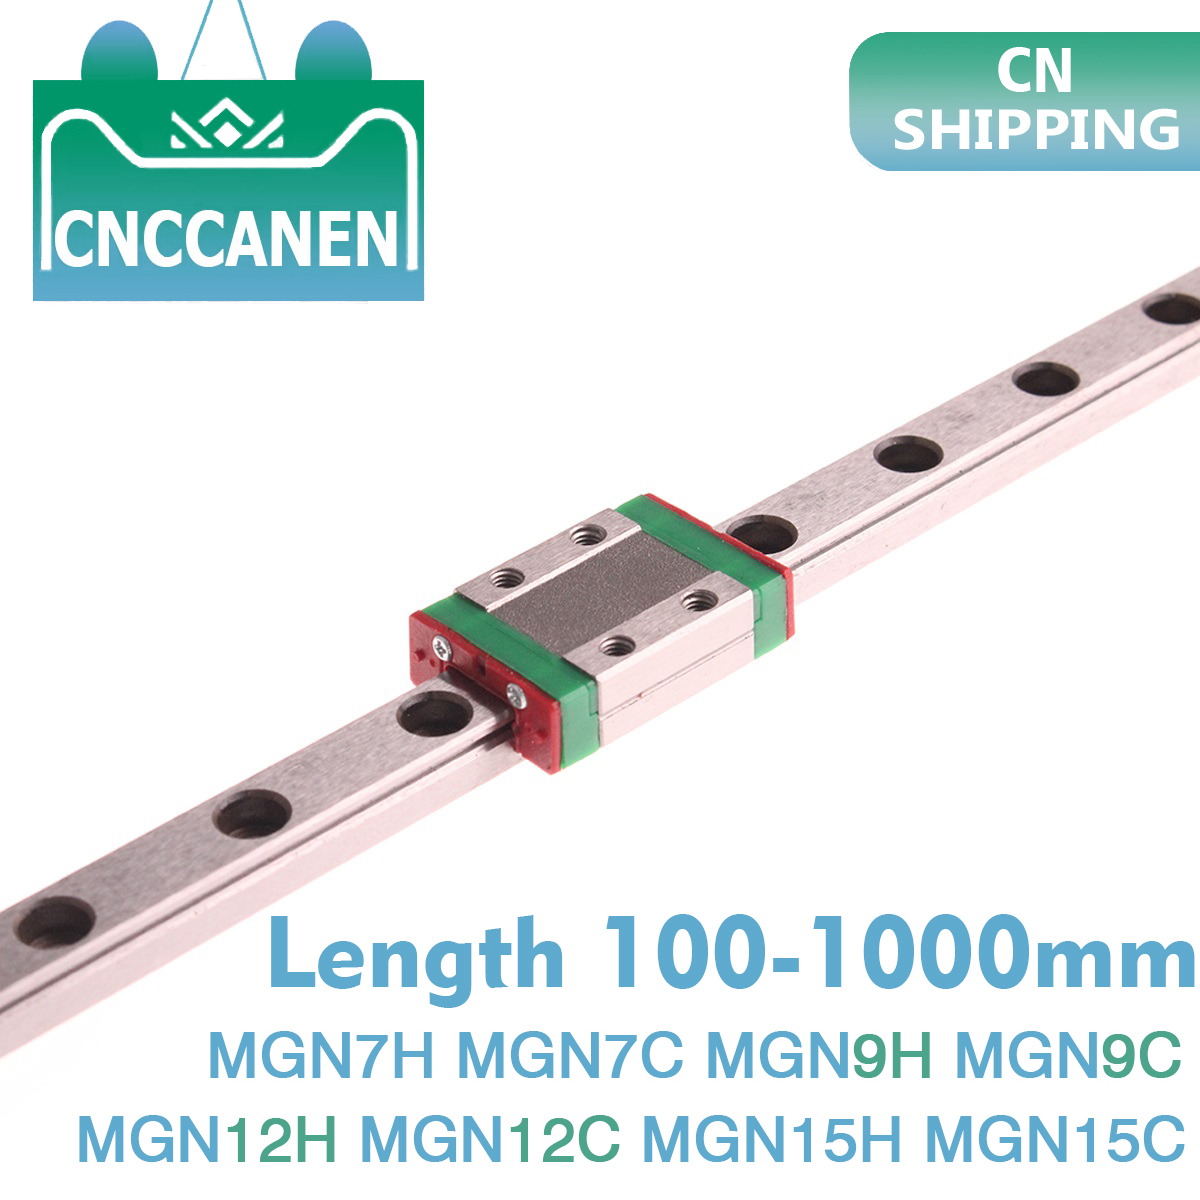 MGN7 MGN9 MGN12 MGN15 100-1000mm glissière linéaire Miniature 1pc Guide linéaire MGN + 1pc MGN9H ou MGN9C chariot imprimante 3D CNC